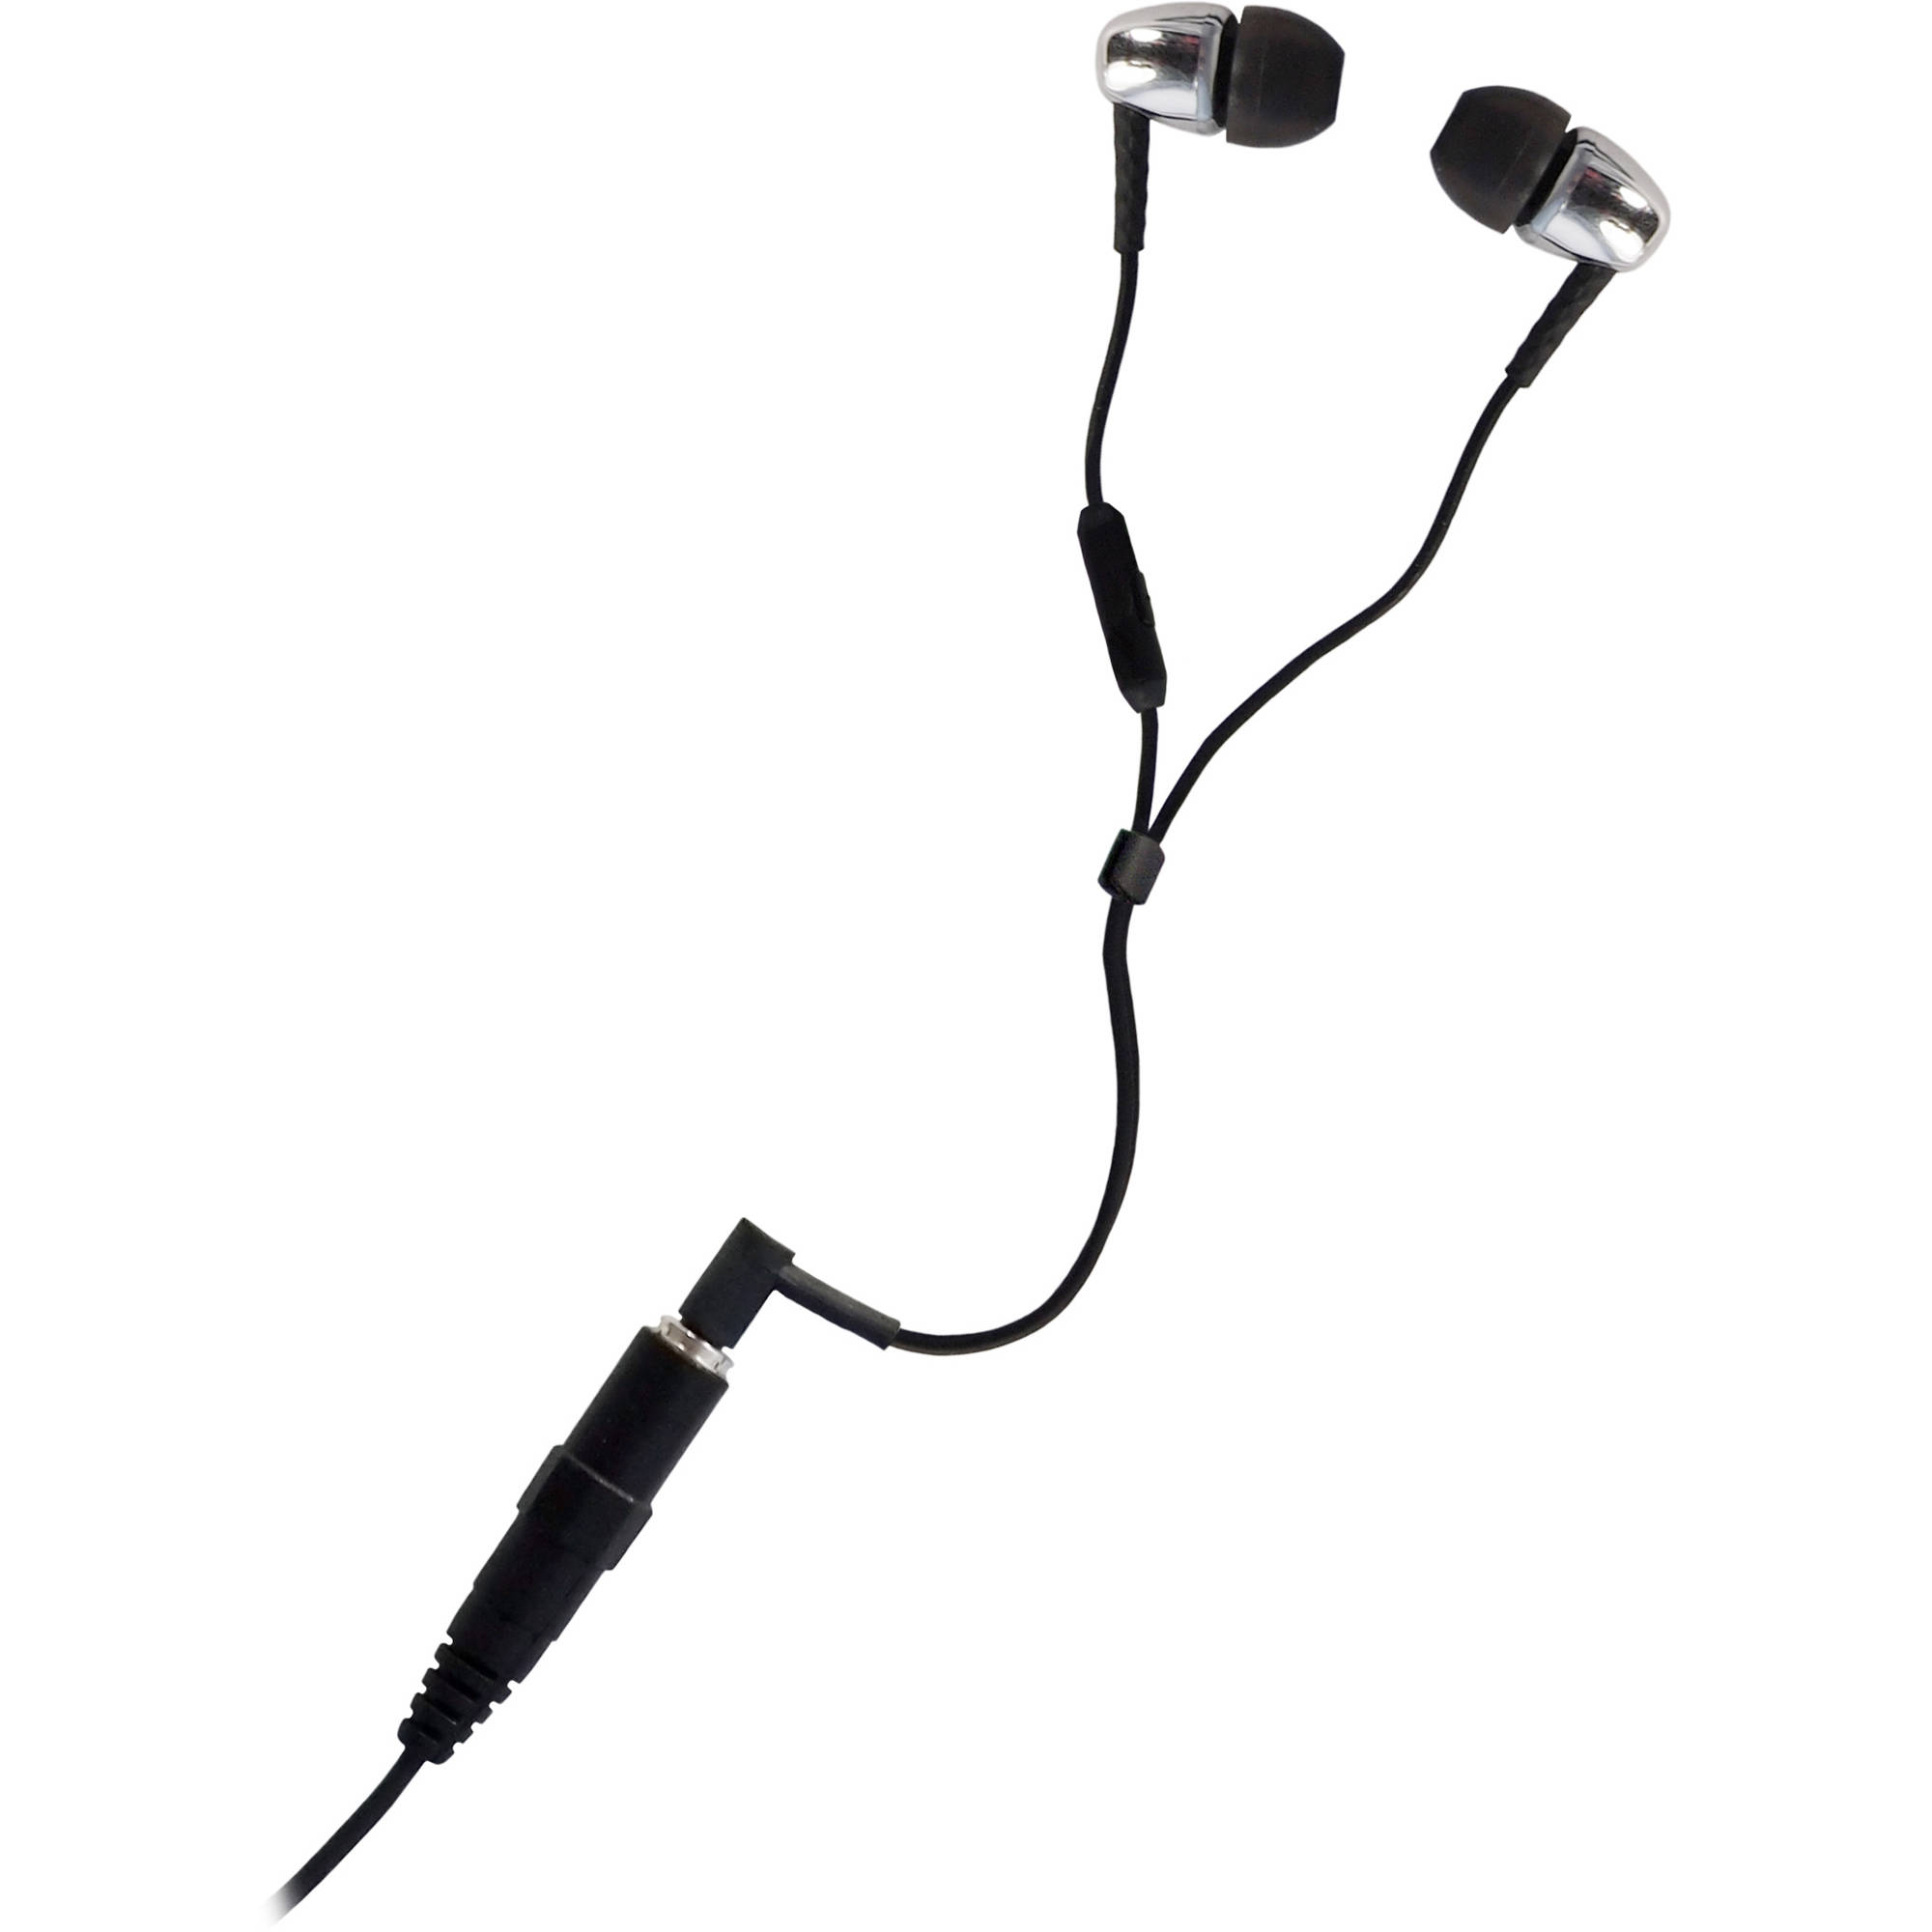 Arichtop 3.5mm Motorbike Helmet Headphone Earphone with Microphone Speaker for MP3 Cellphone Motorcycle Motor Headsets Accessories